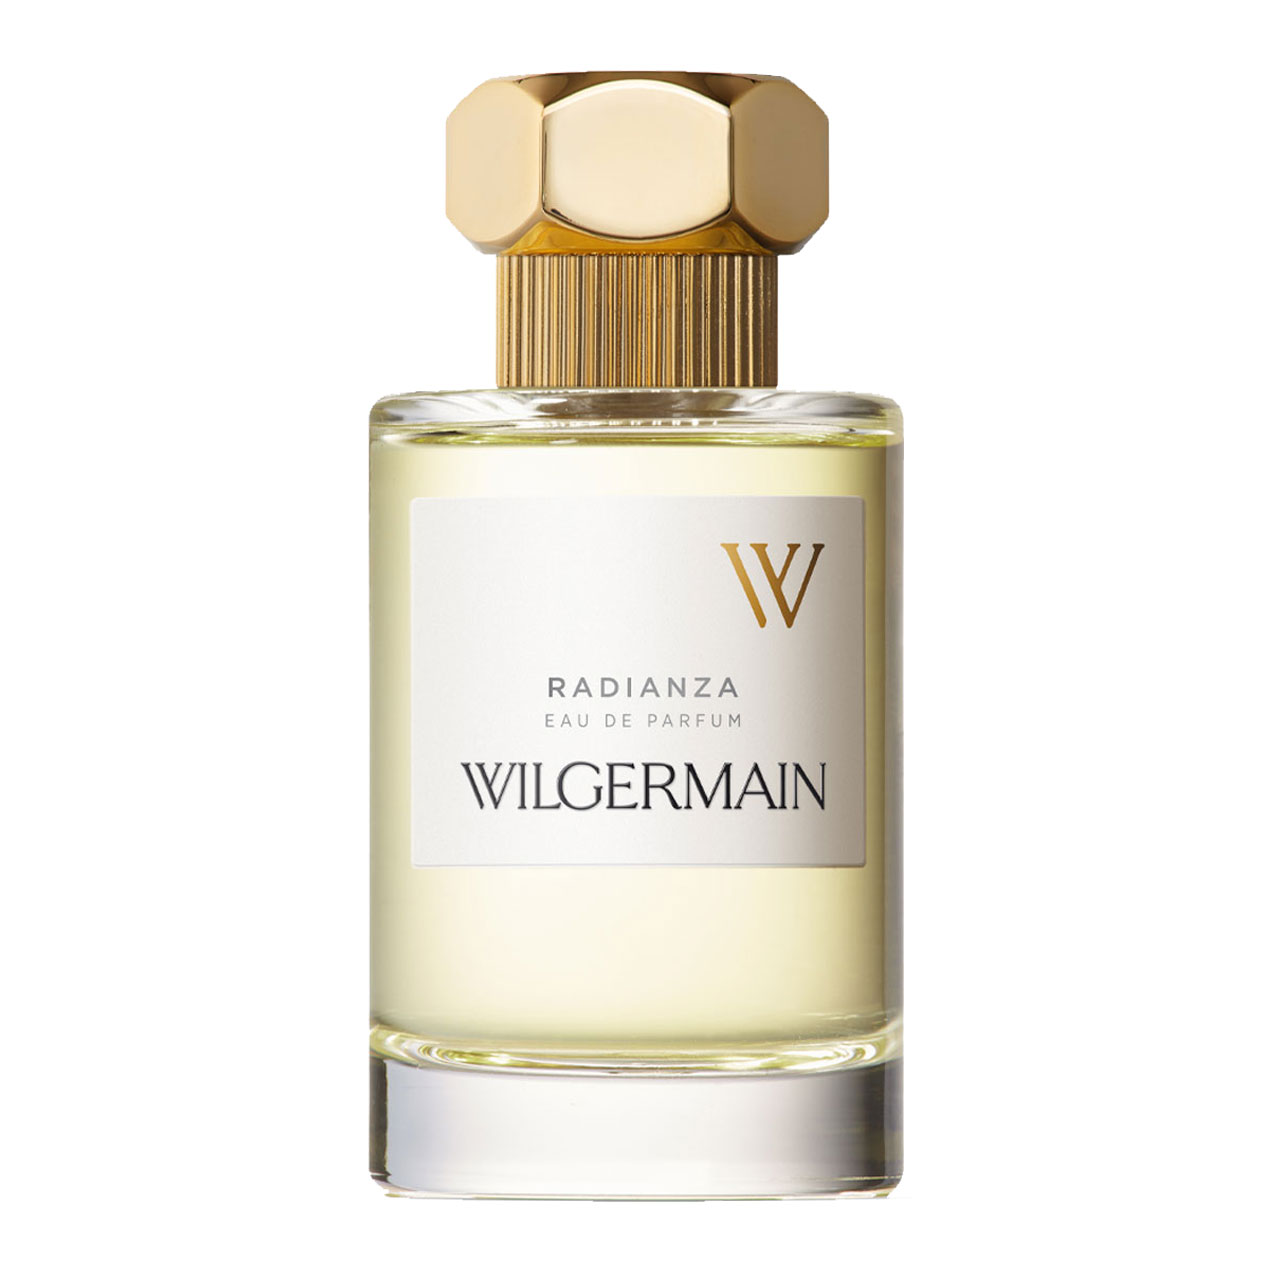 Wilgermain Radianza